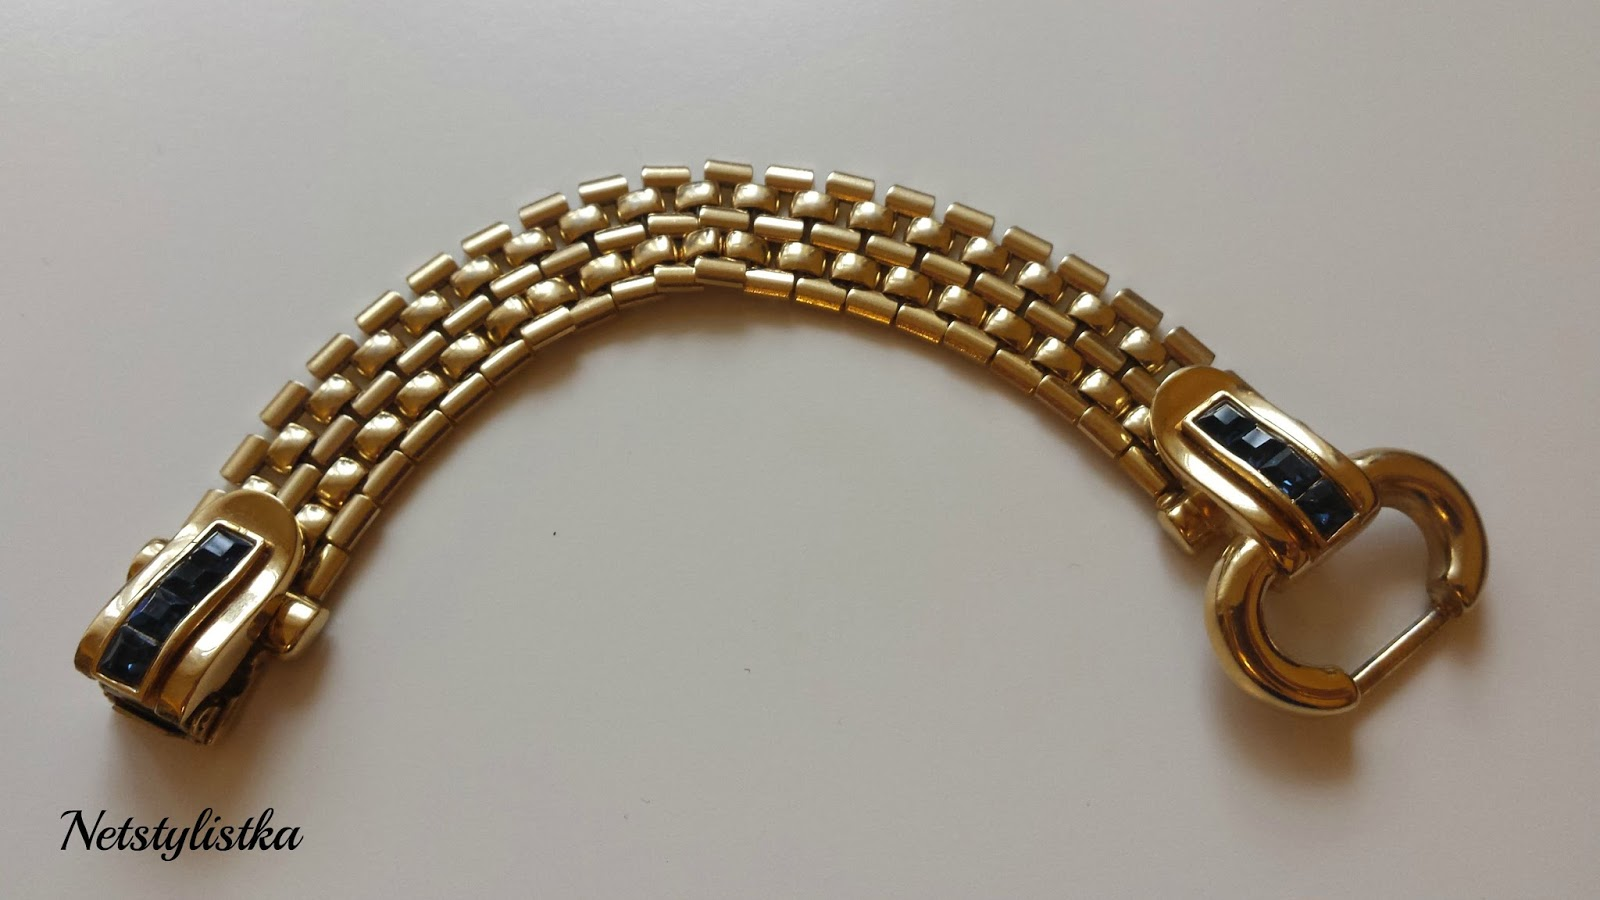 Givenchy bransoletka vintage od projektanta